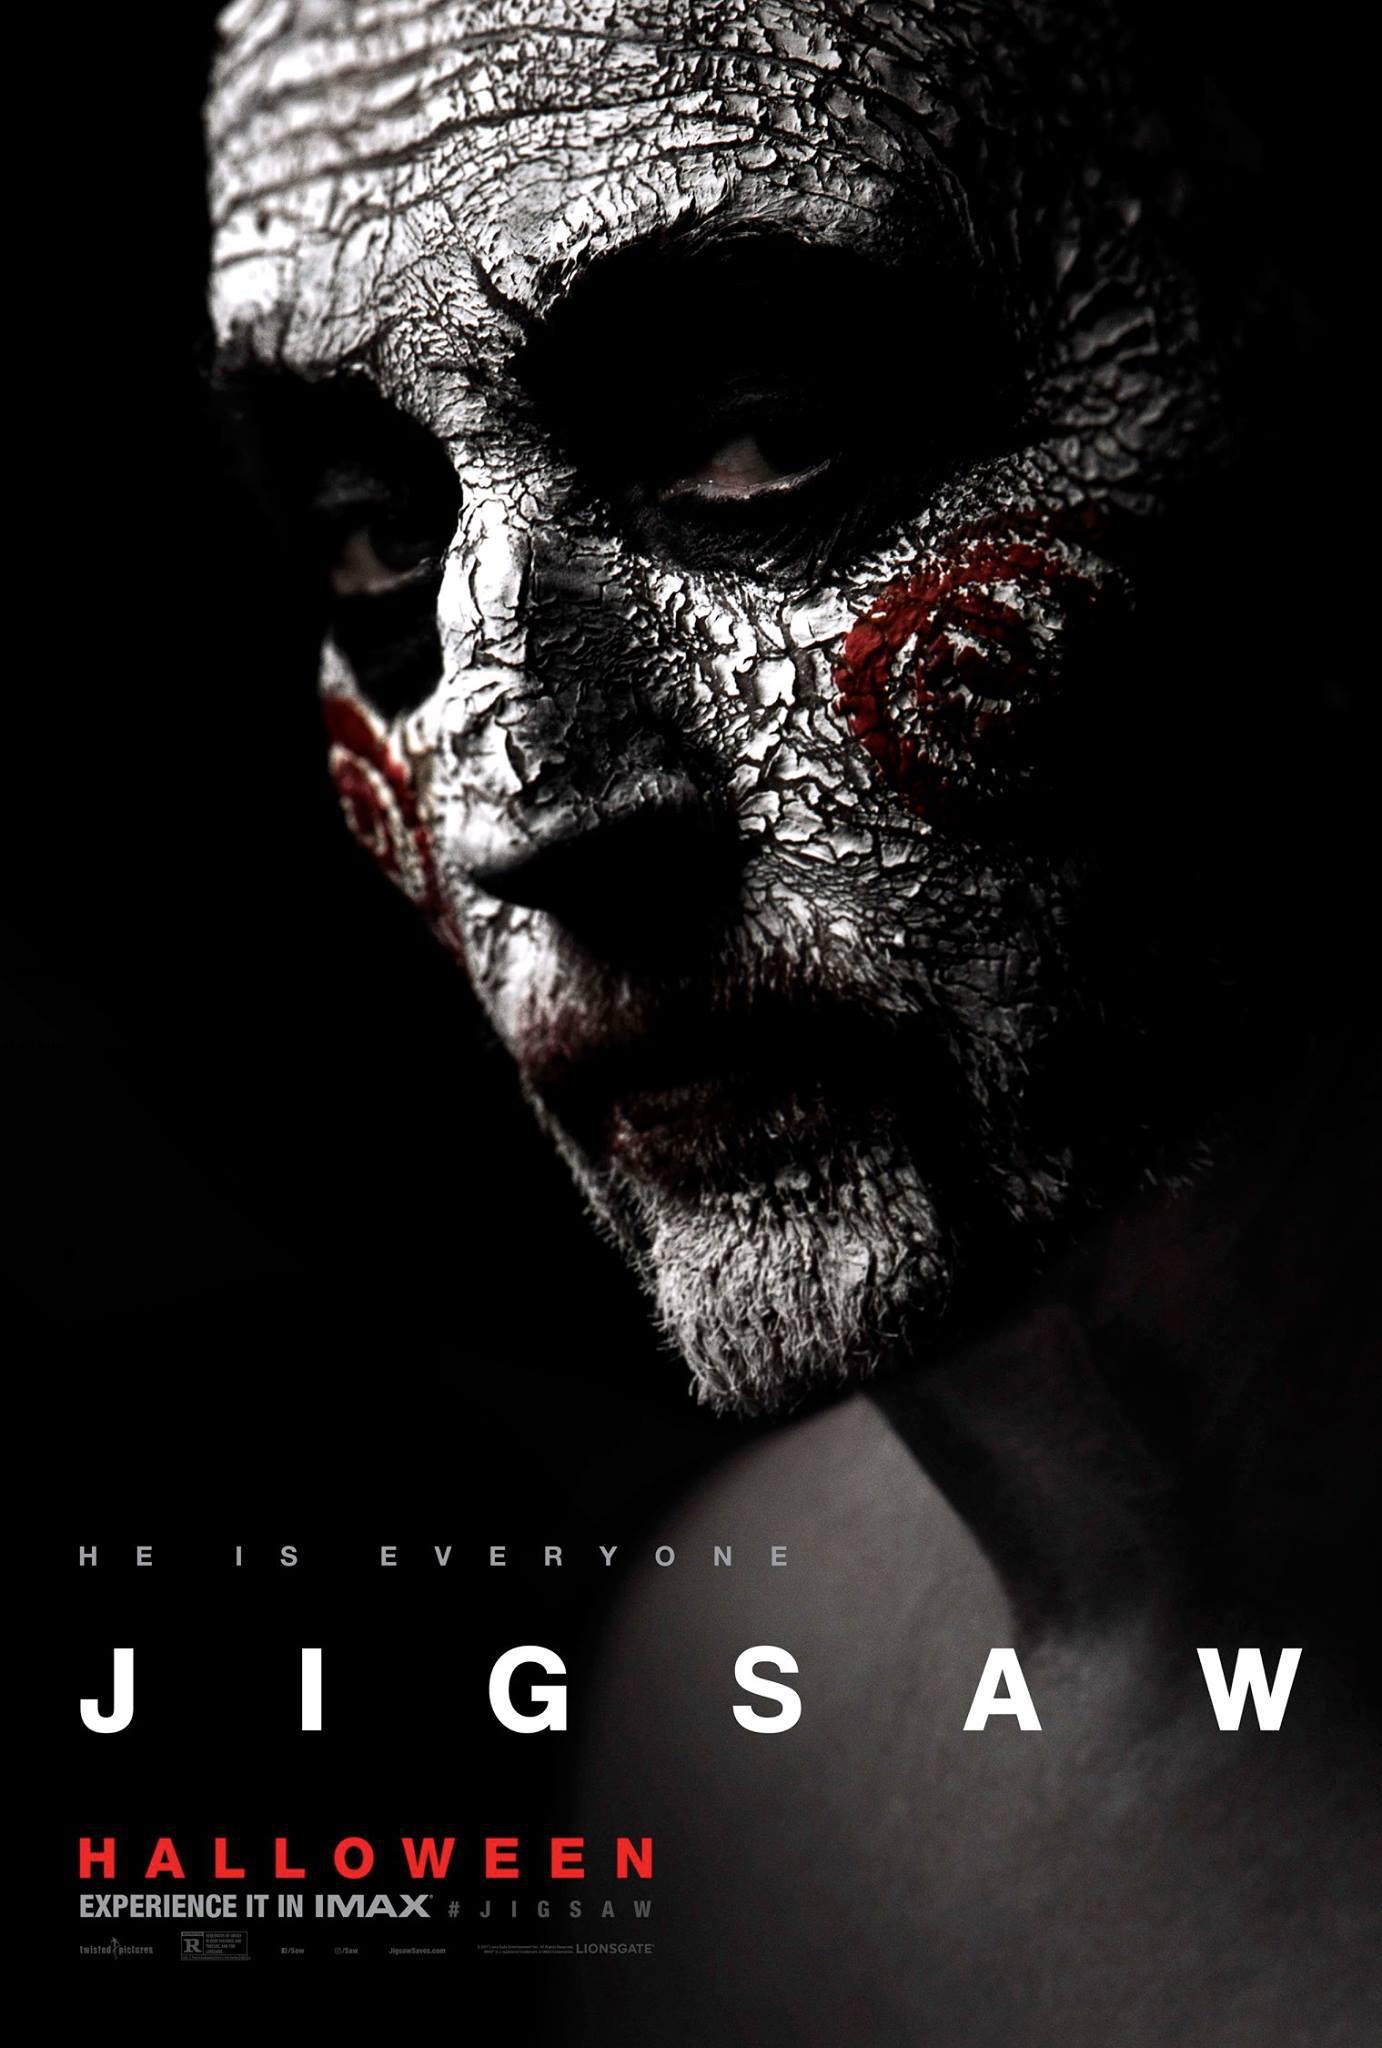 Jigsaw character1